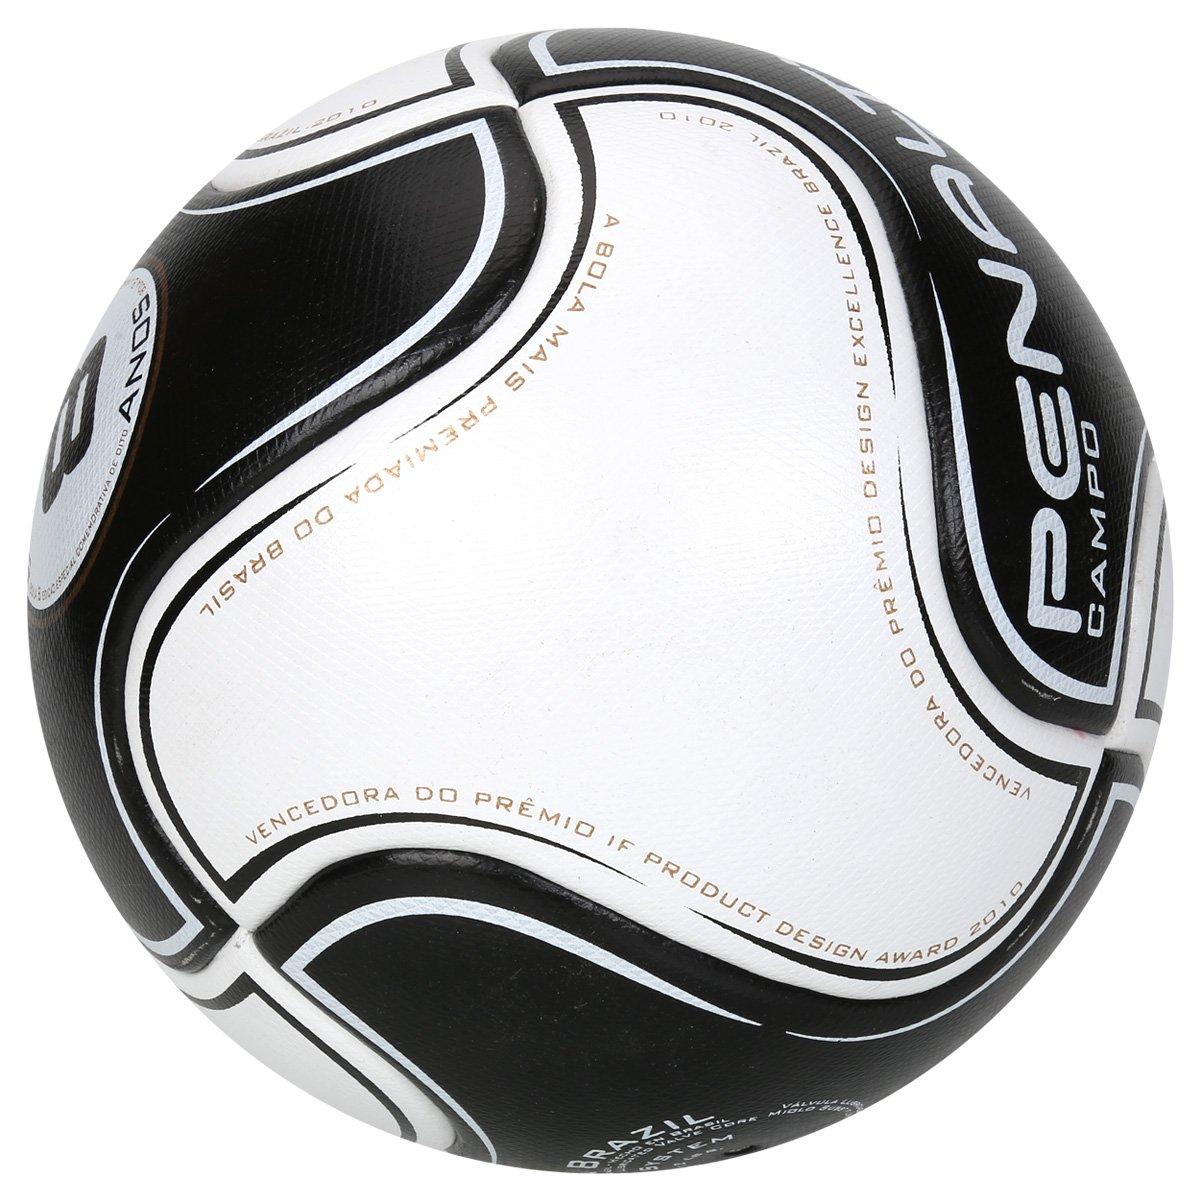 Bola Futebol Campo Penalty 8 S11 R2 6 - Compre Agora  44d27d7c97df6